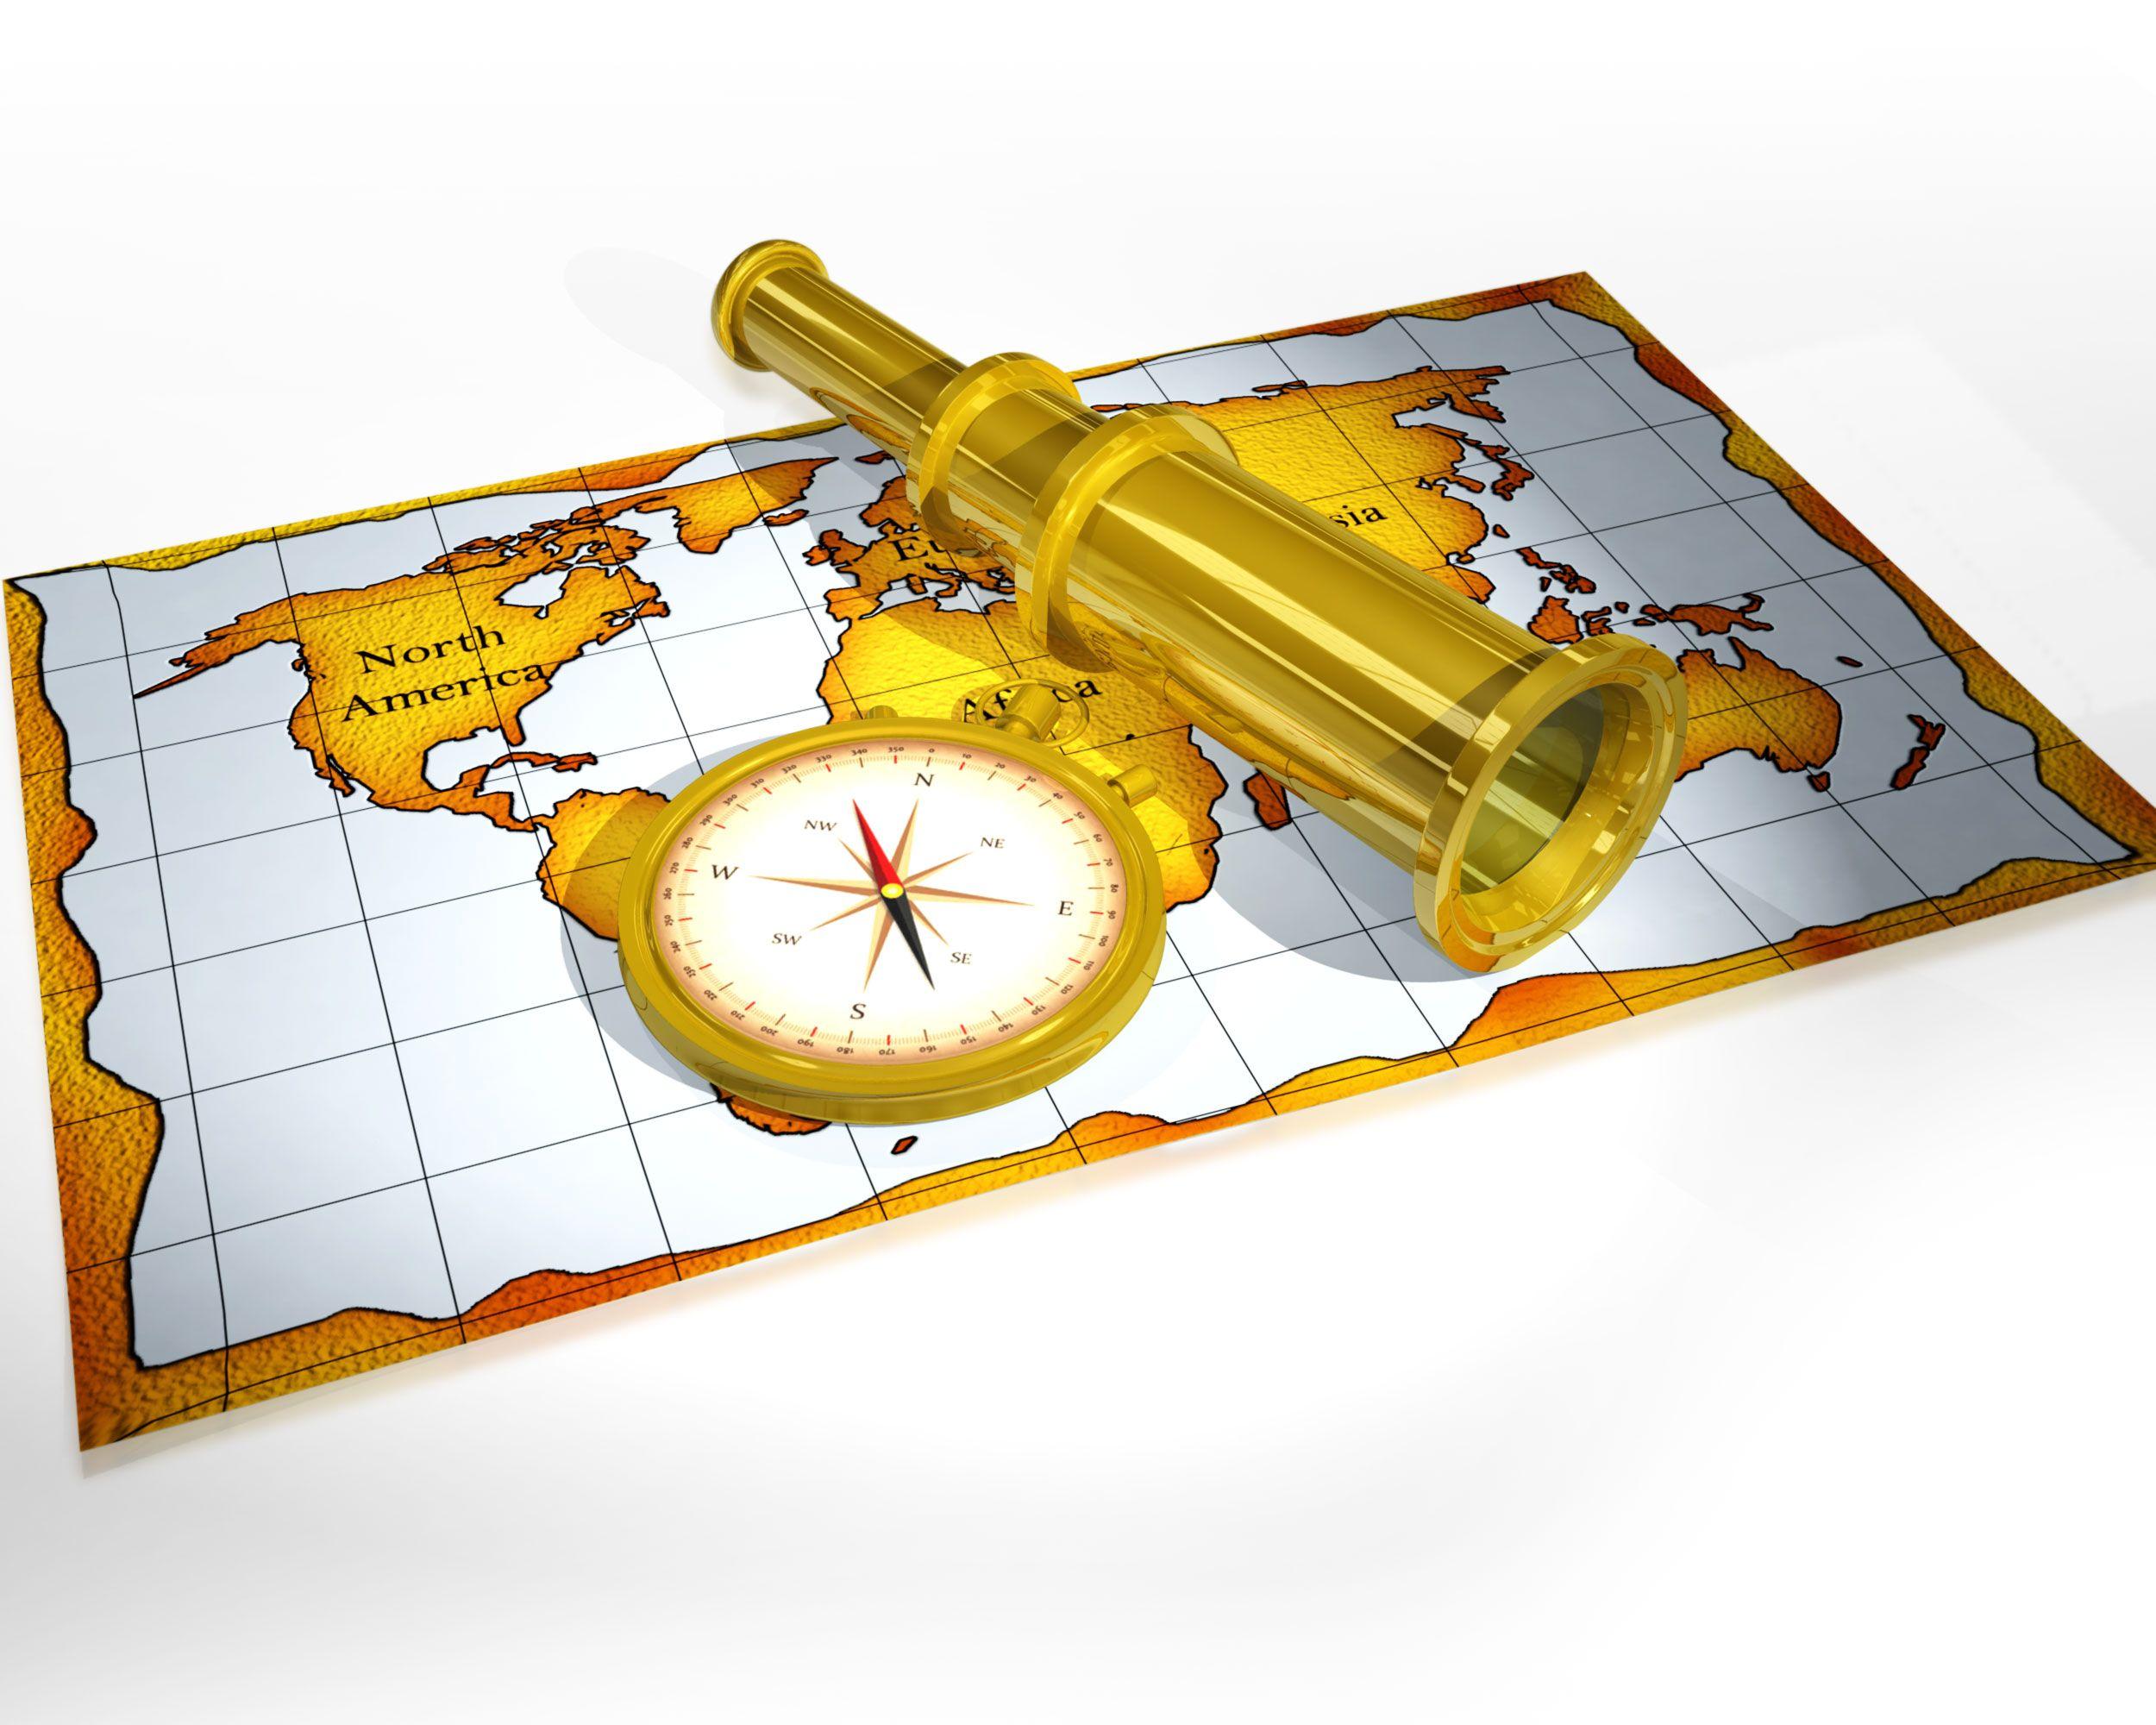 compass_map_and_binoculars_for_marine_navigation_stock_photo_Slide01